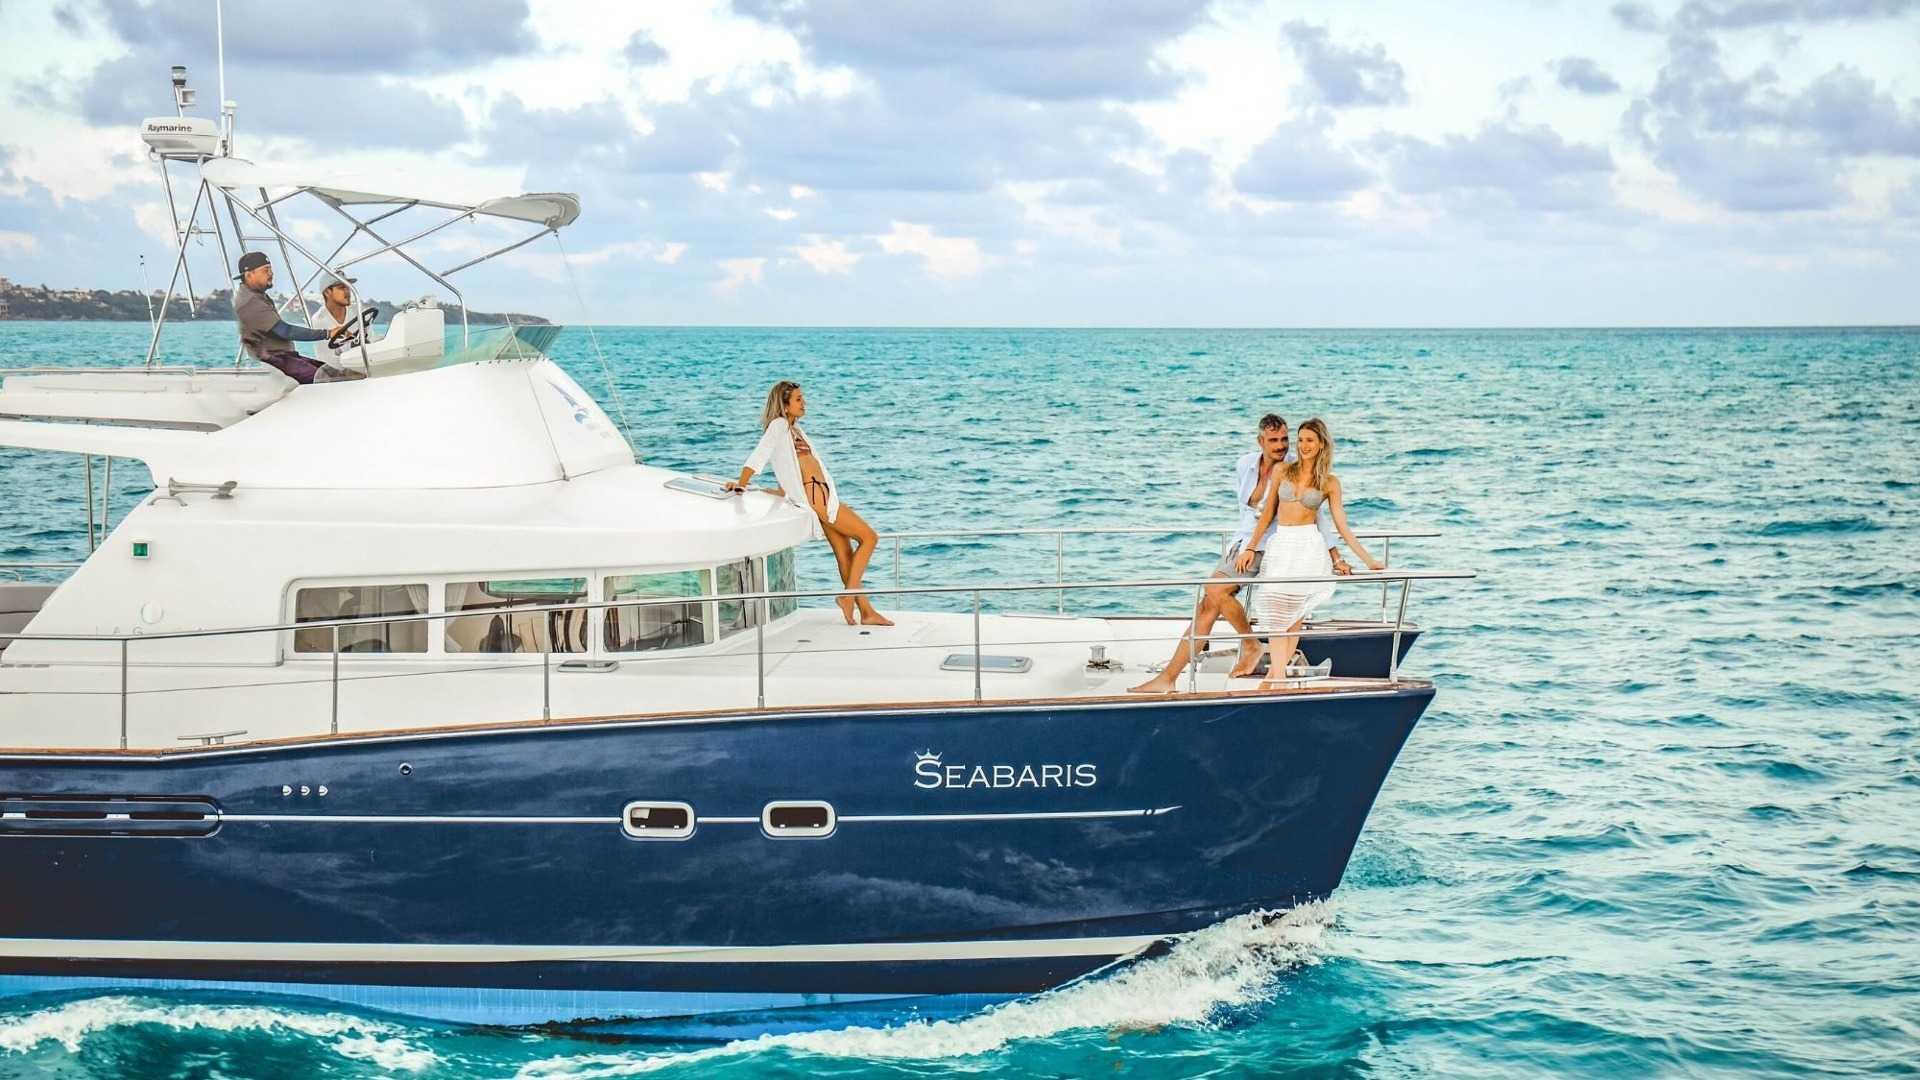 4 - LowRes - Private Isla Mujeres tour in catamaran - Seabaris - Cancun Sailing